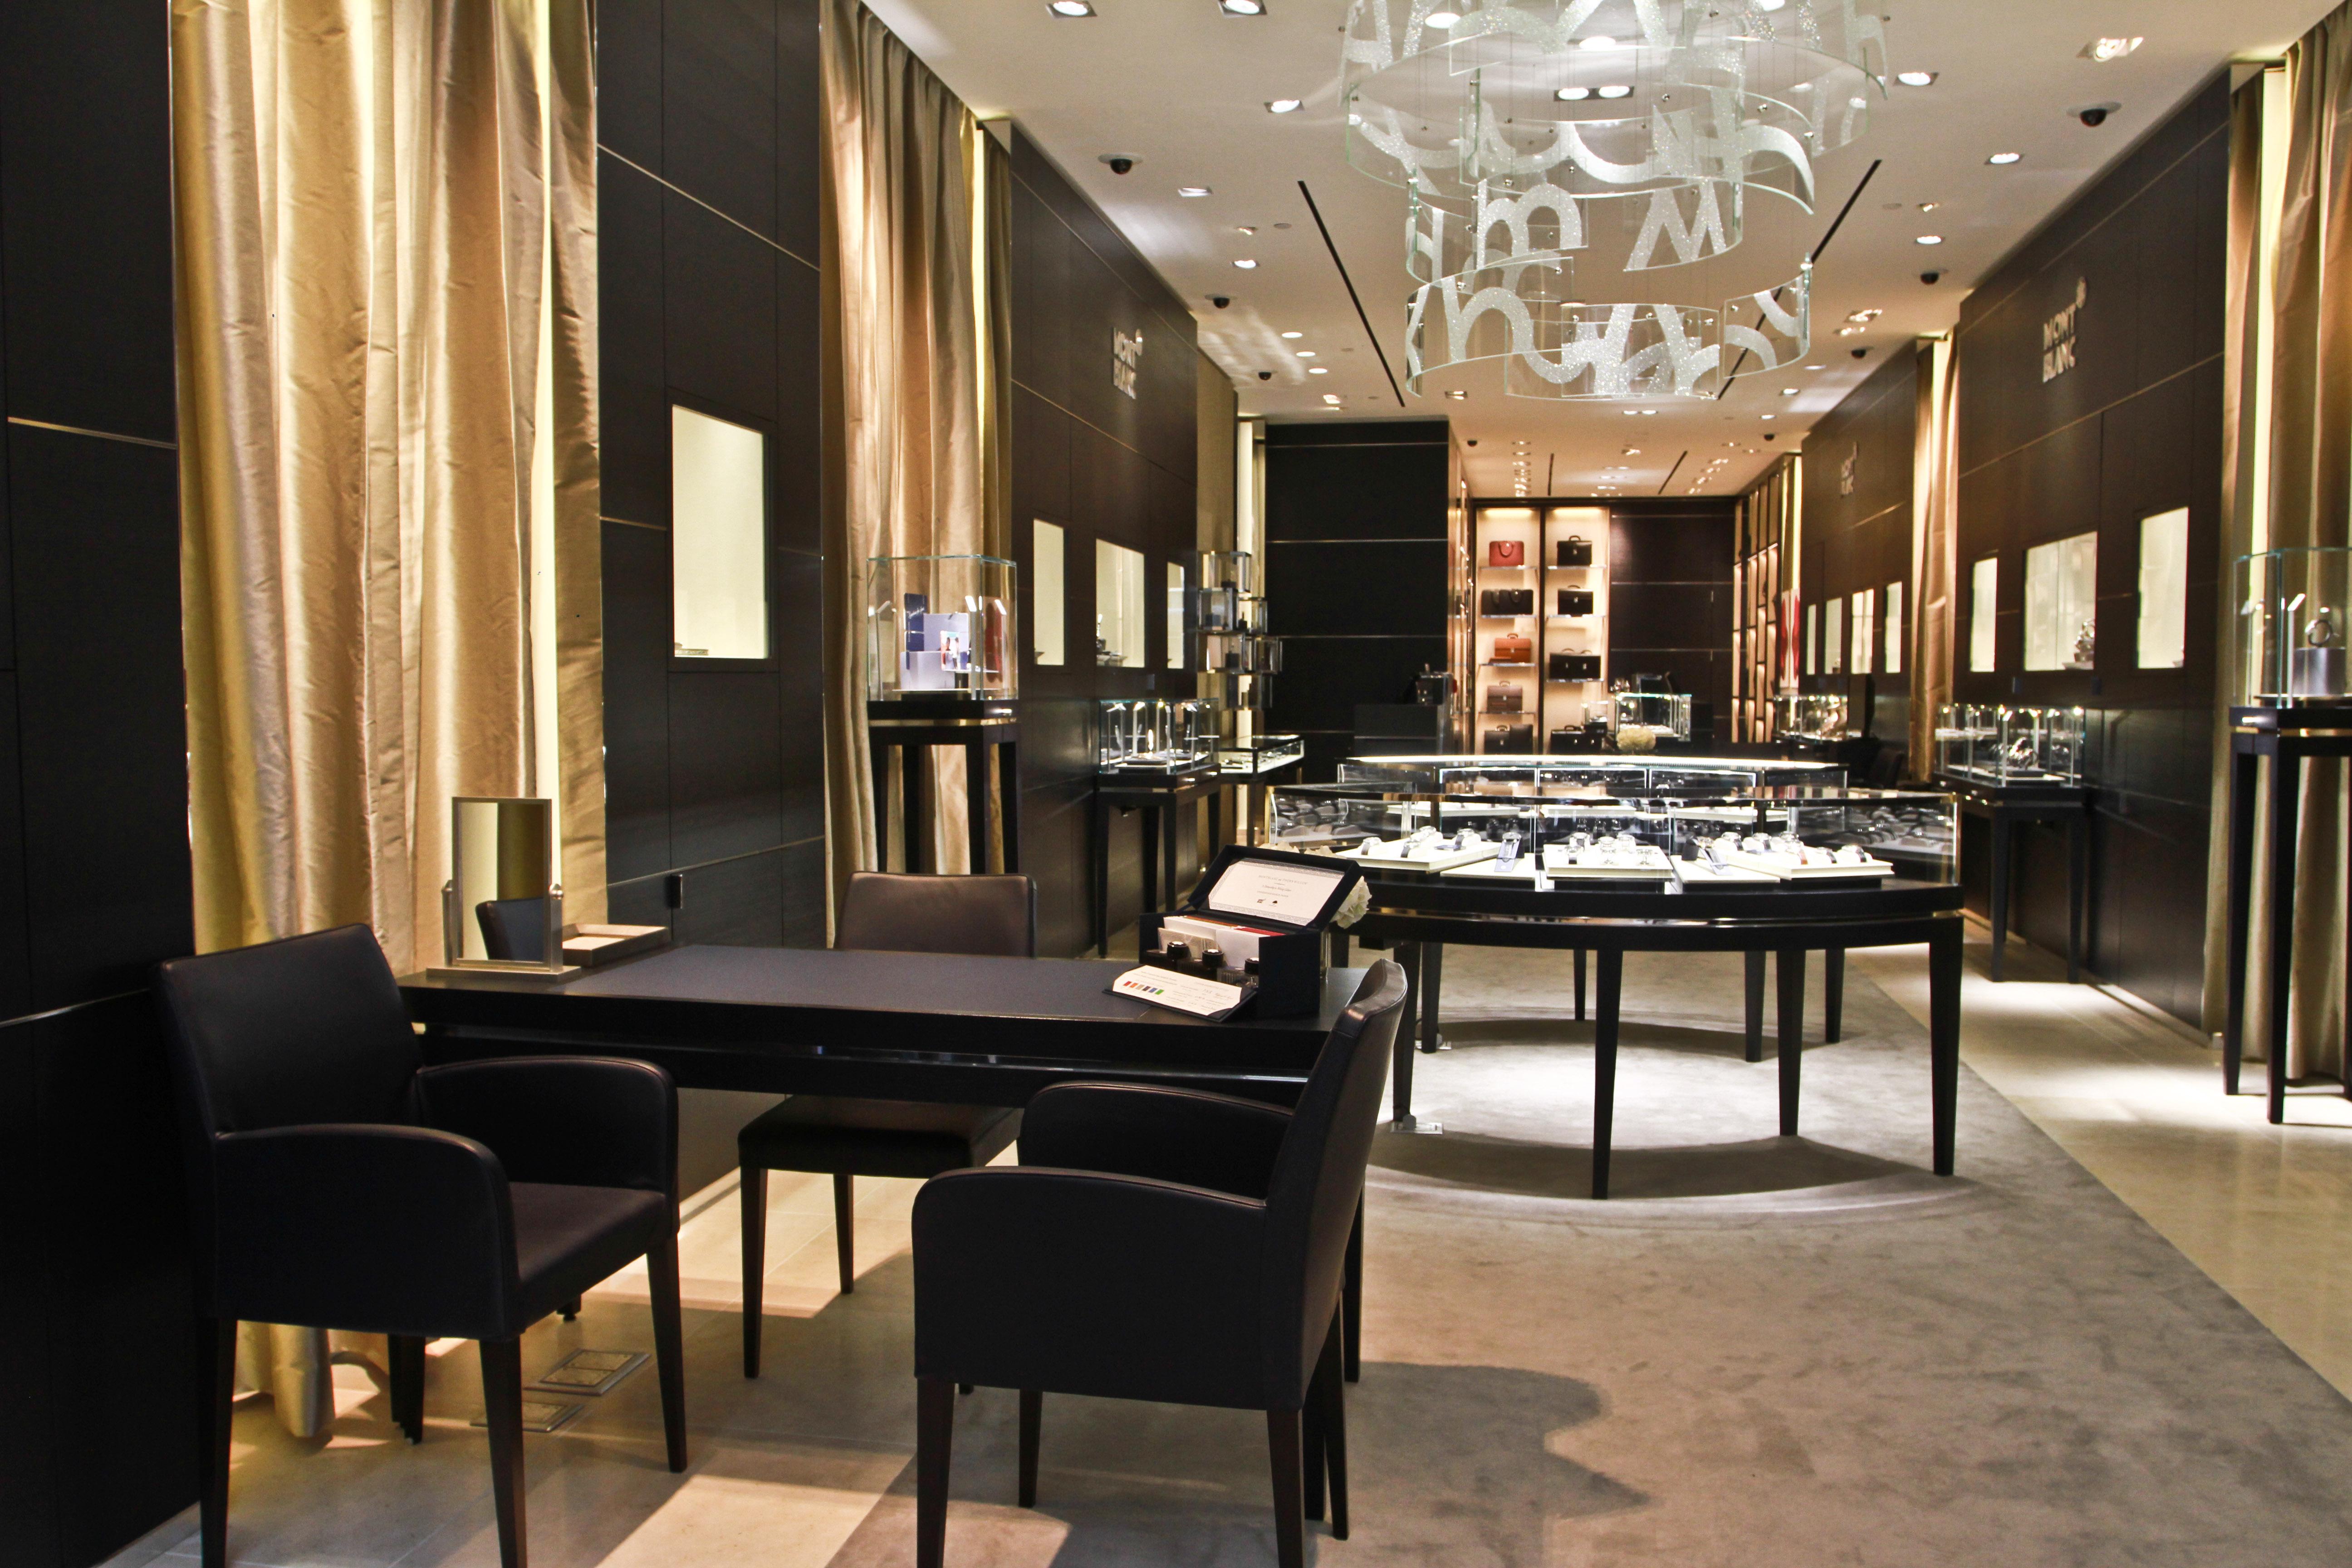 montblanc josh lucas celebrate madison avenue boutique opening. Black Bedroom Furniture Sets. Home Design Ideas